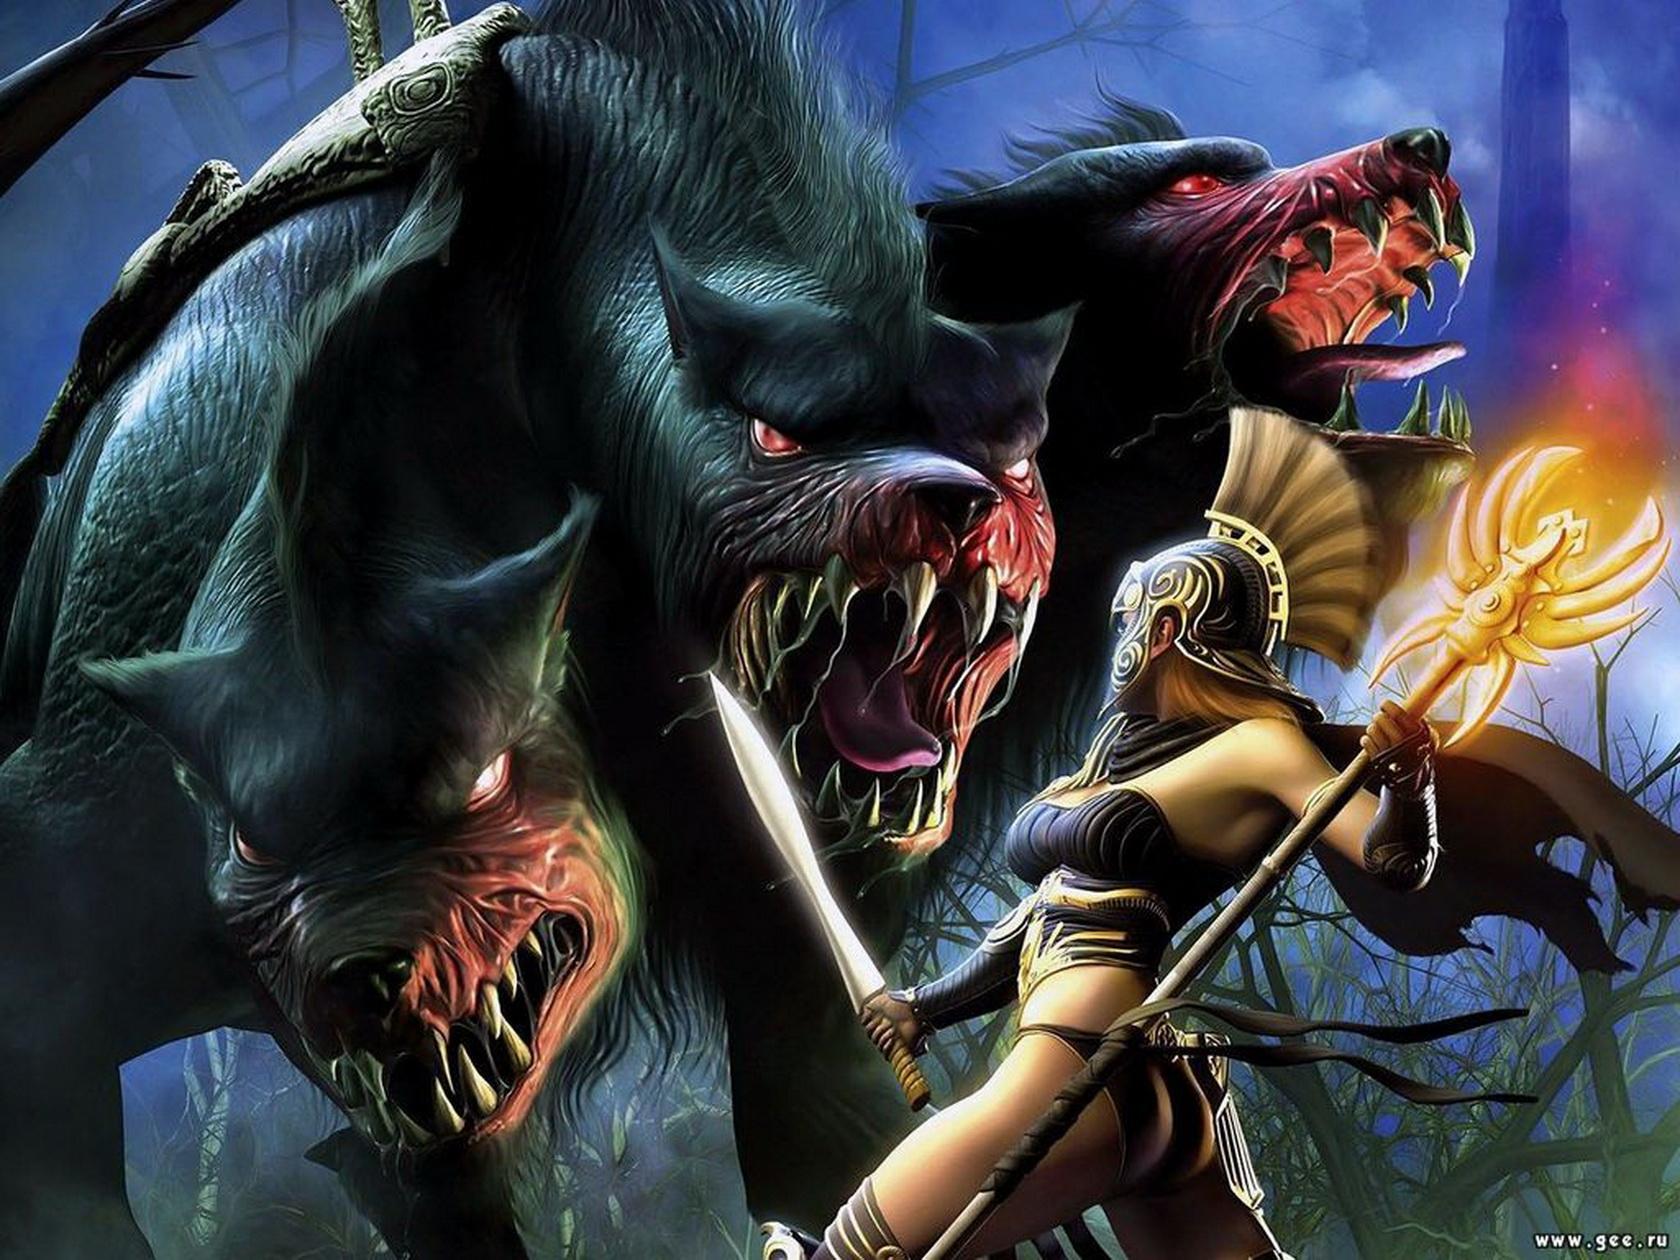 Скачать обои Titan Quest Immortal Throne, game, pc games, игра, видео